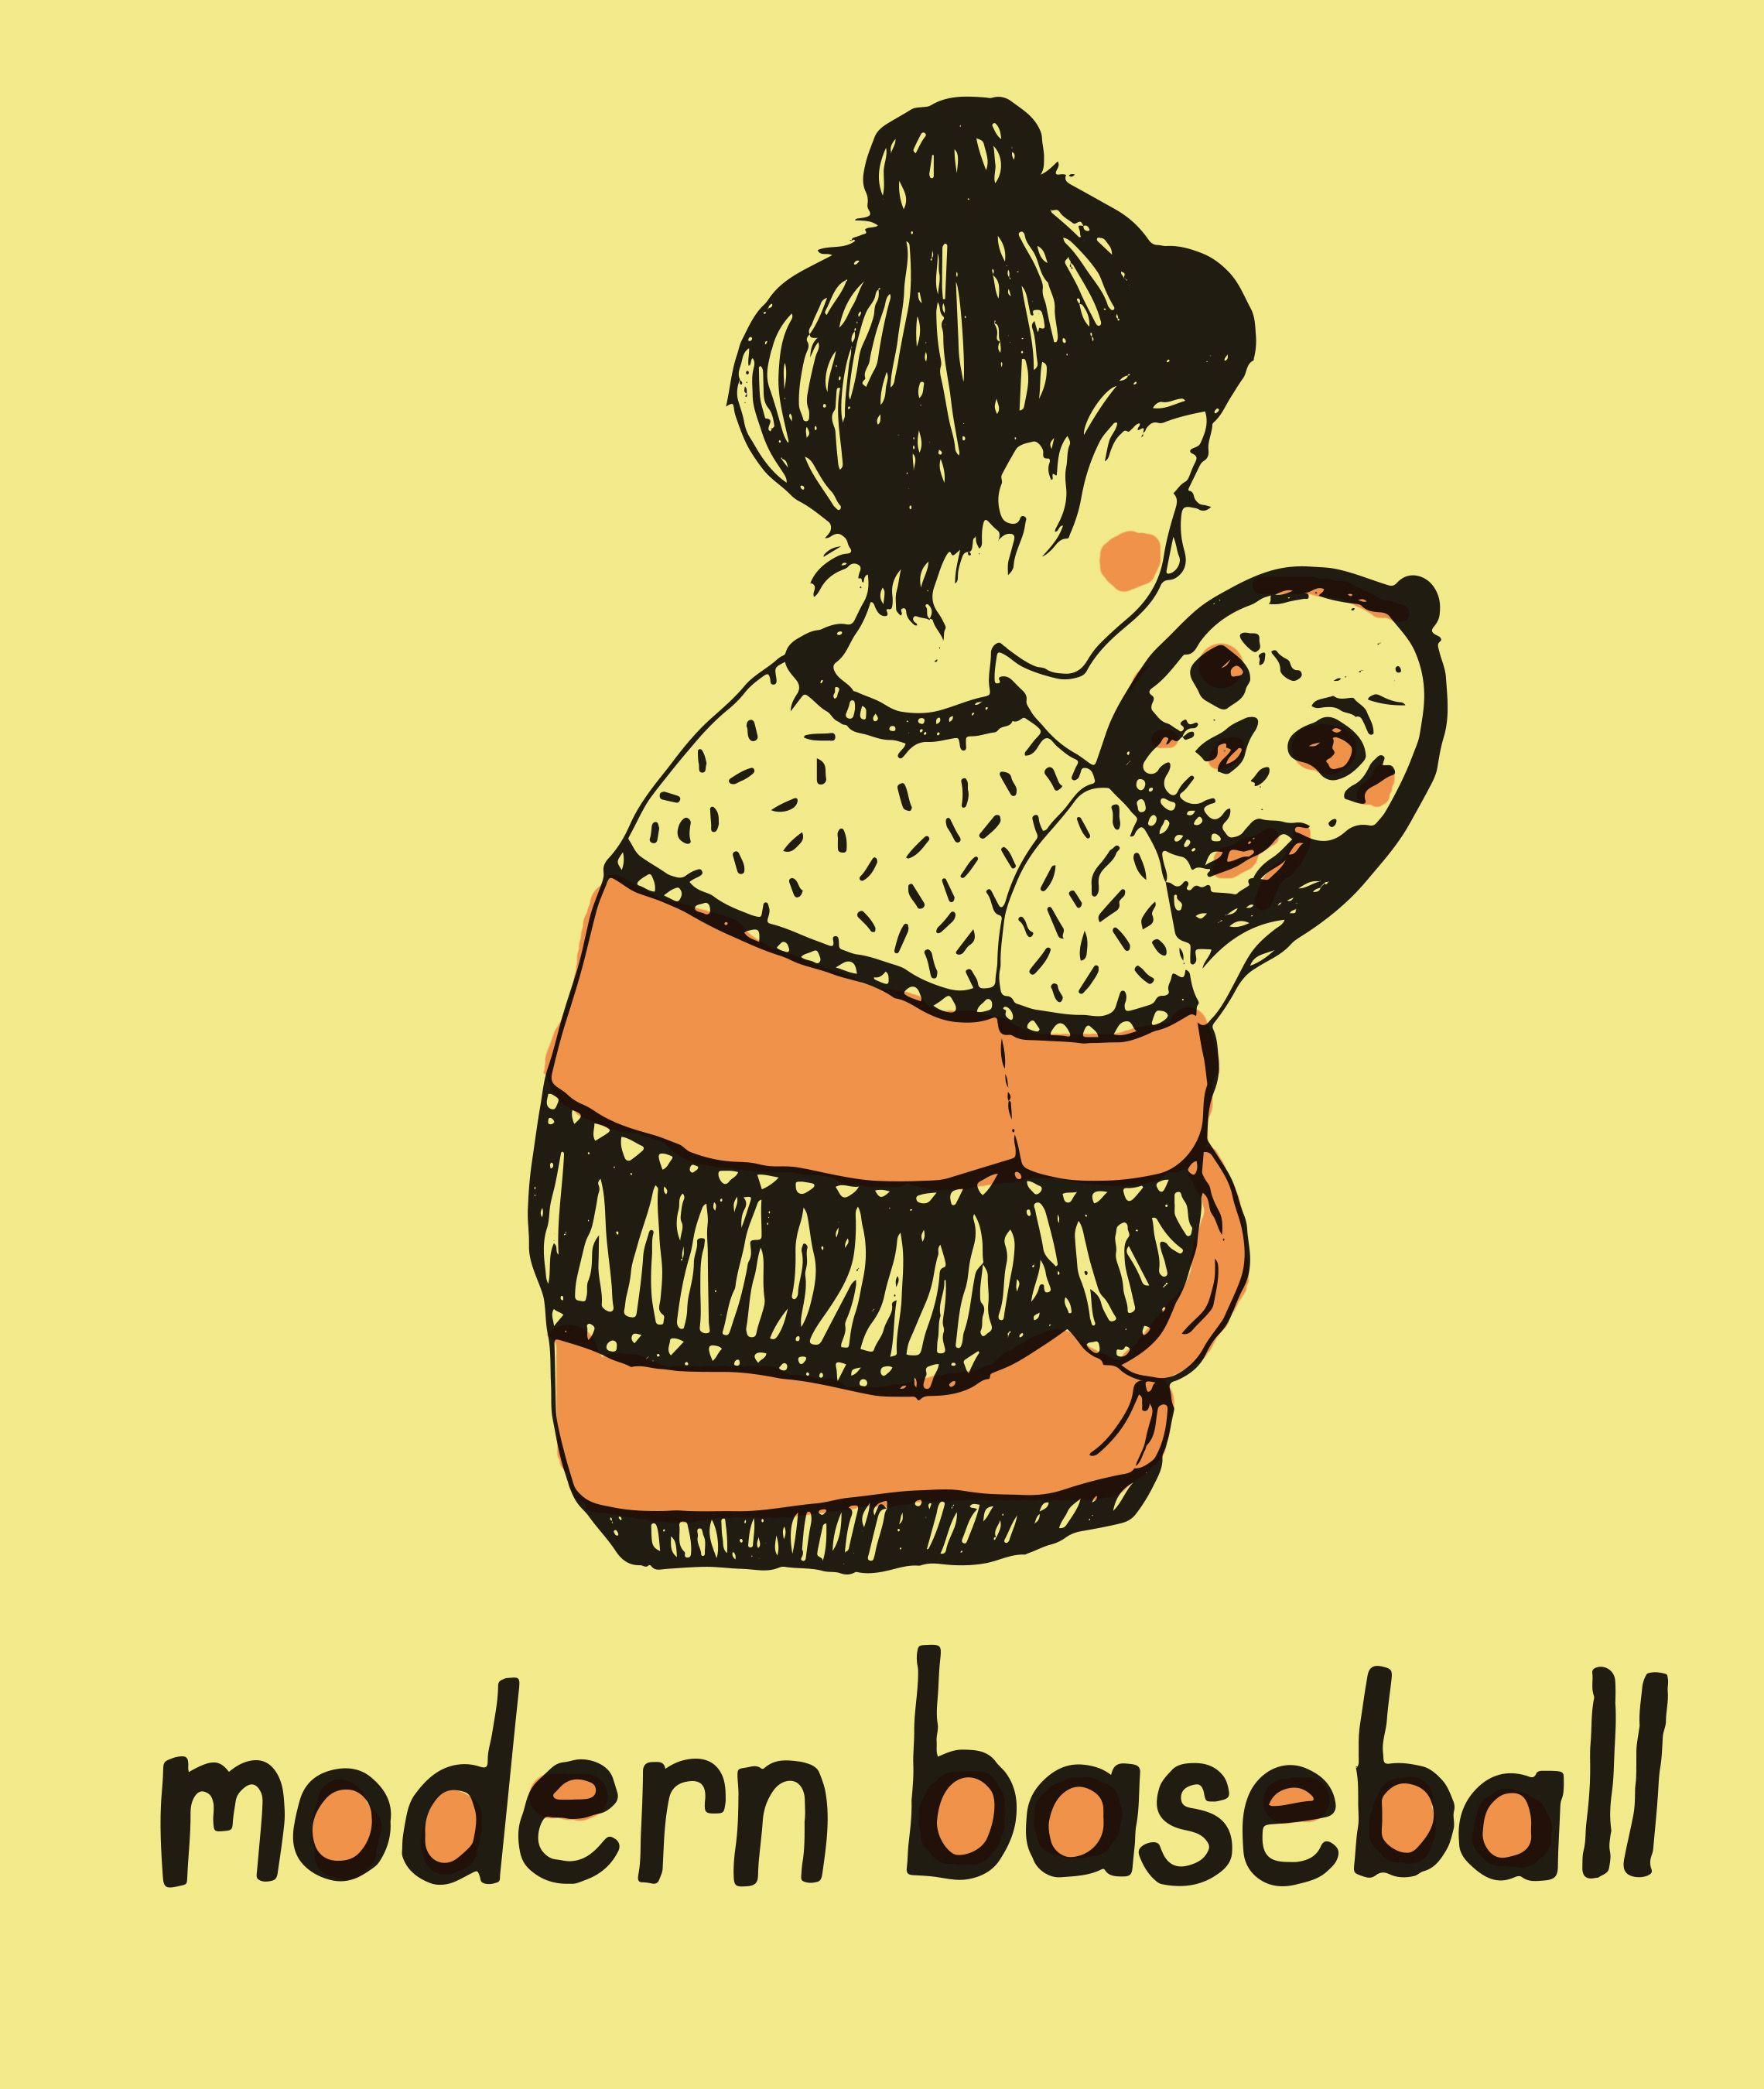 Modern Baseball Illustration Word Drawings Pop Punk Bands Musical Art